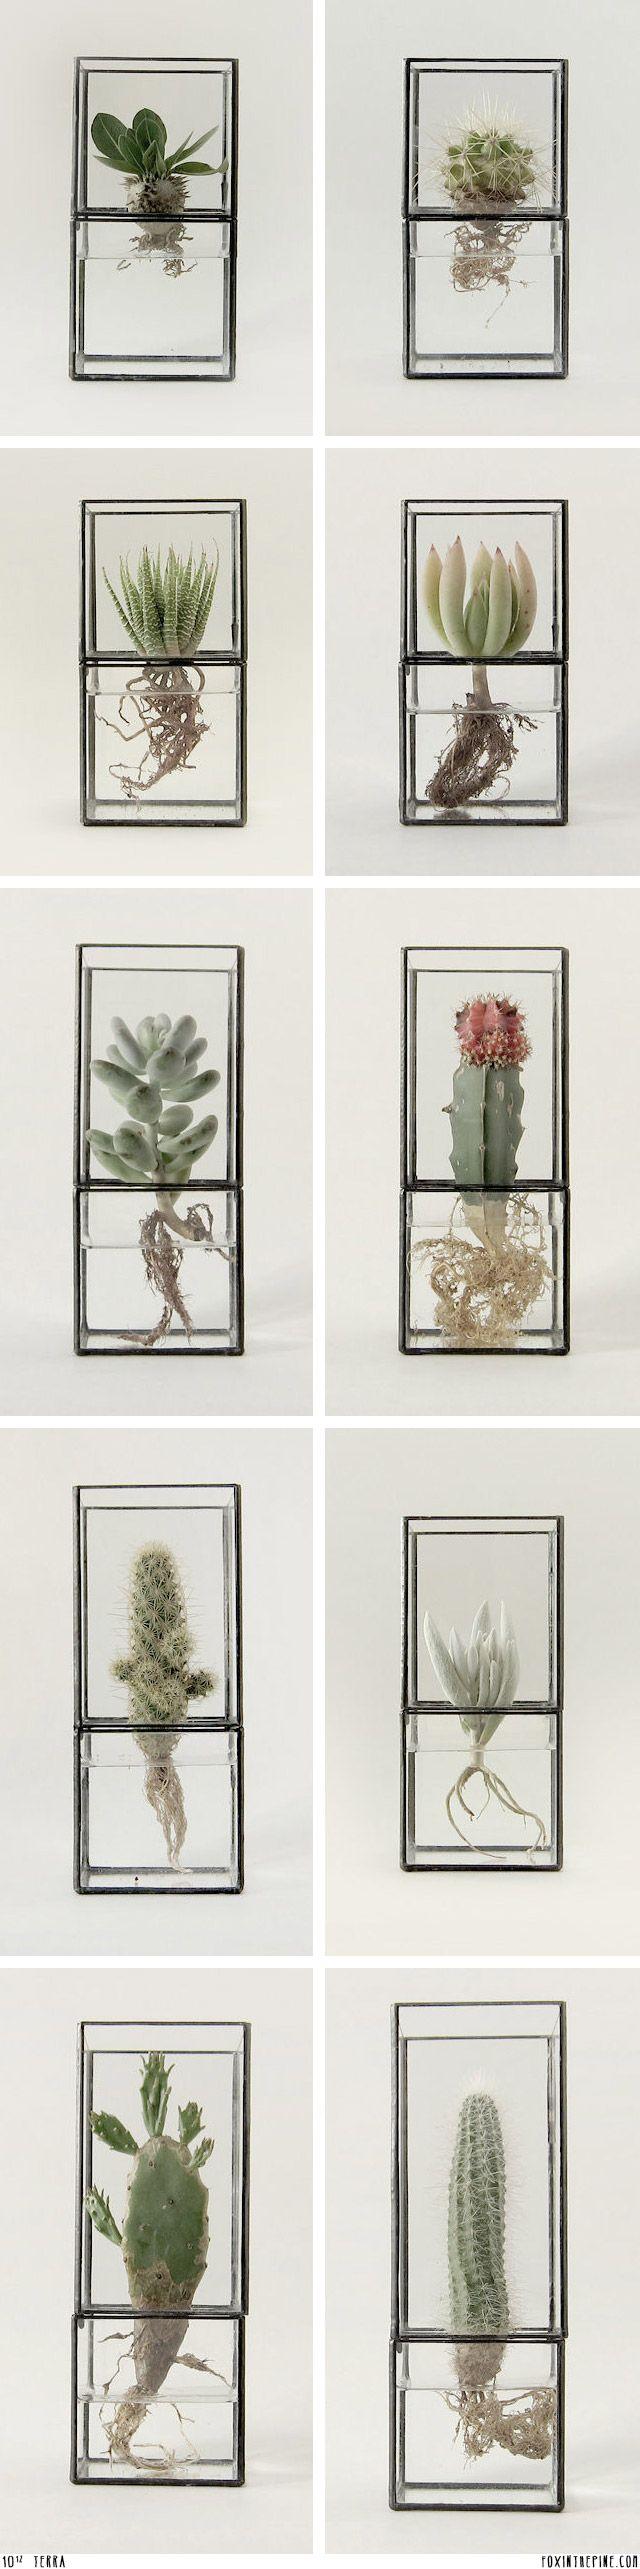 green, water plants